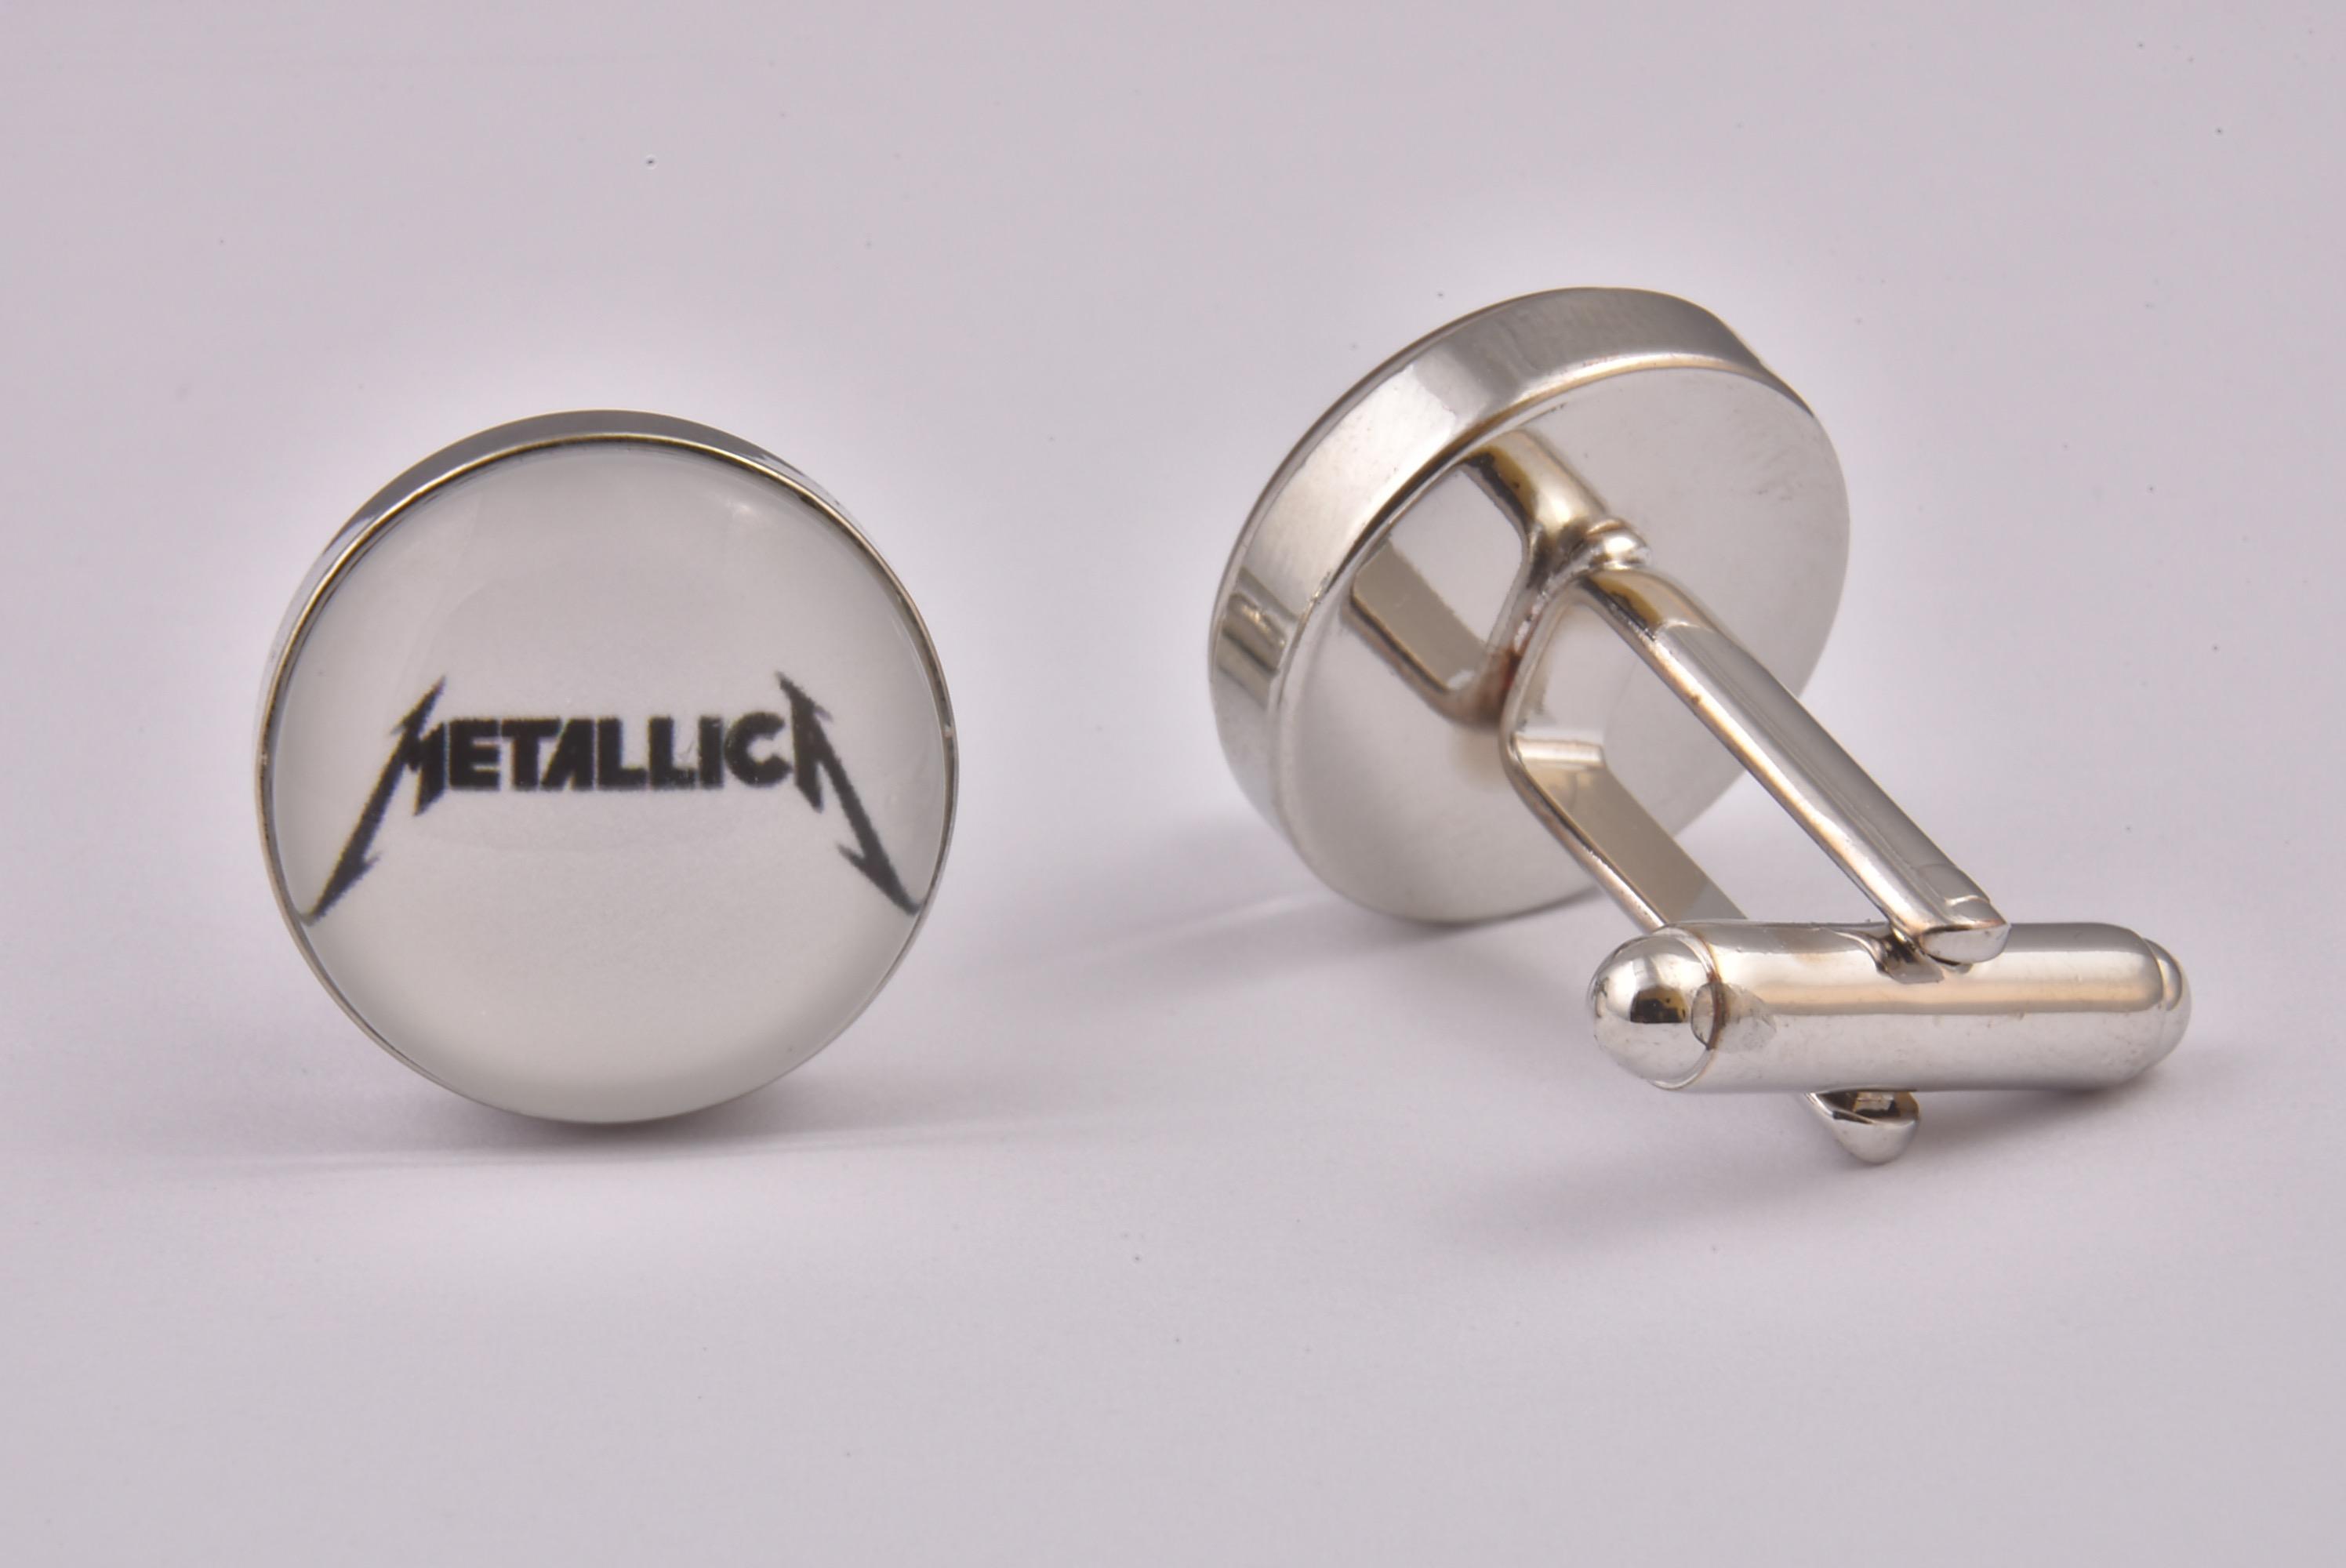 bouton de manchette metallica